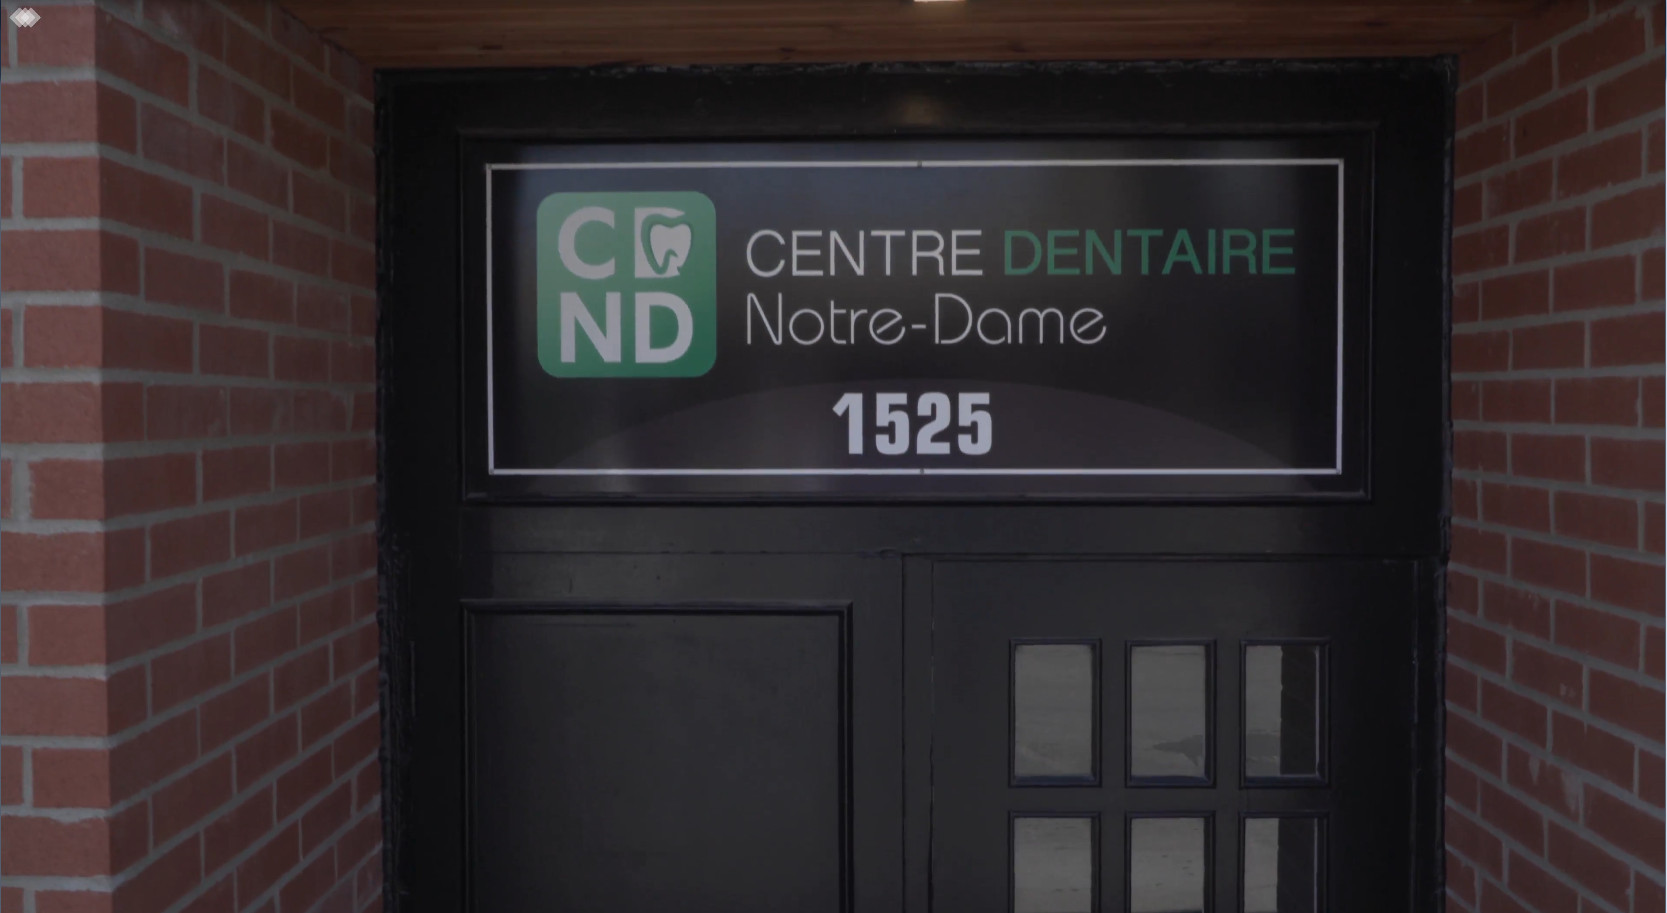 Centre Dentaire Notre-Dame video